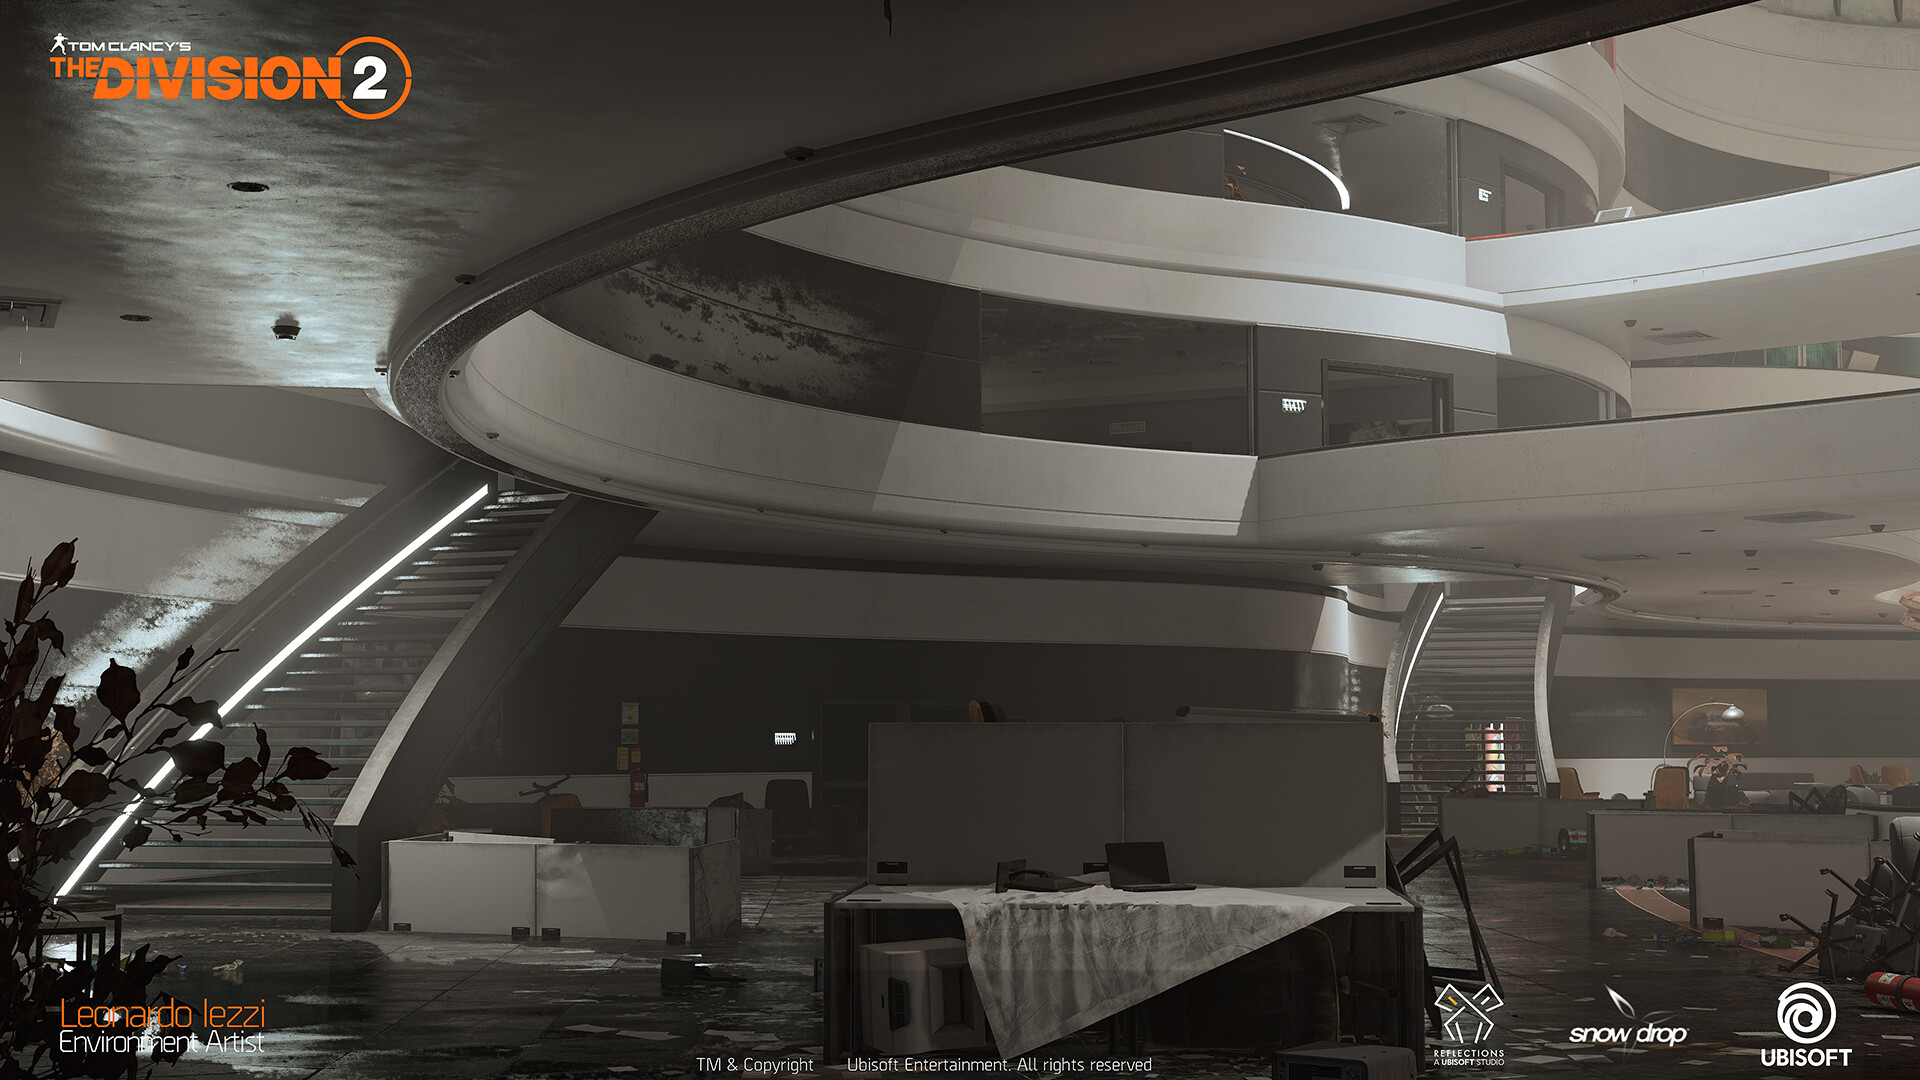 Leonardo iezzi leonardo iezzi the division 2 environment art 02 atrium 012